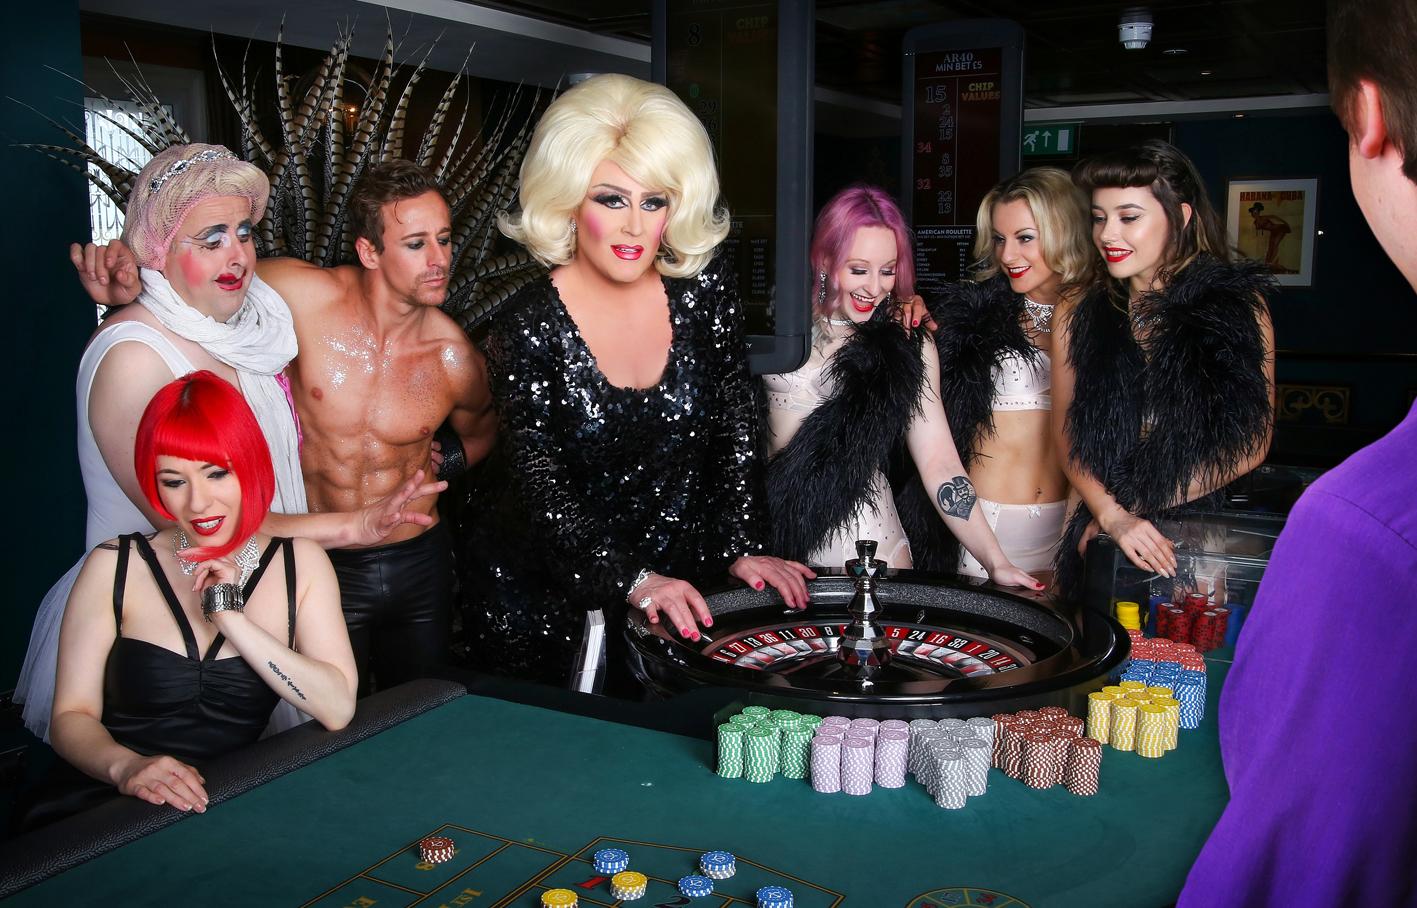 Hippodrome Casino - Leicester Square